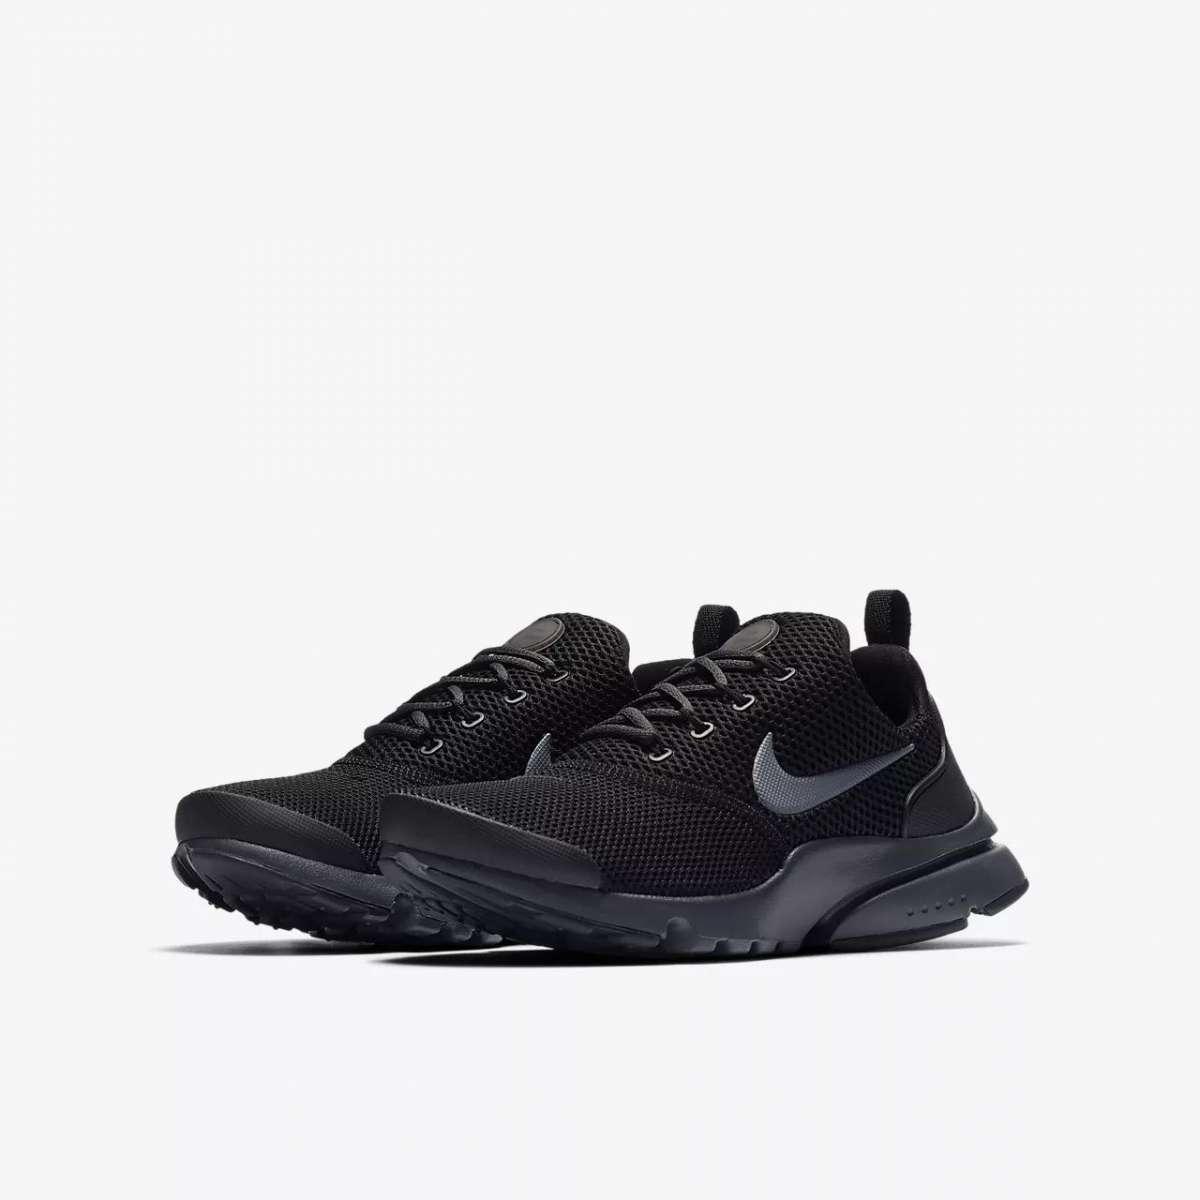 22b0cd57 Кроссовки Найк Nike Air Presto Fly Black, оригинал !